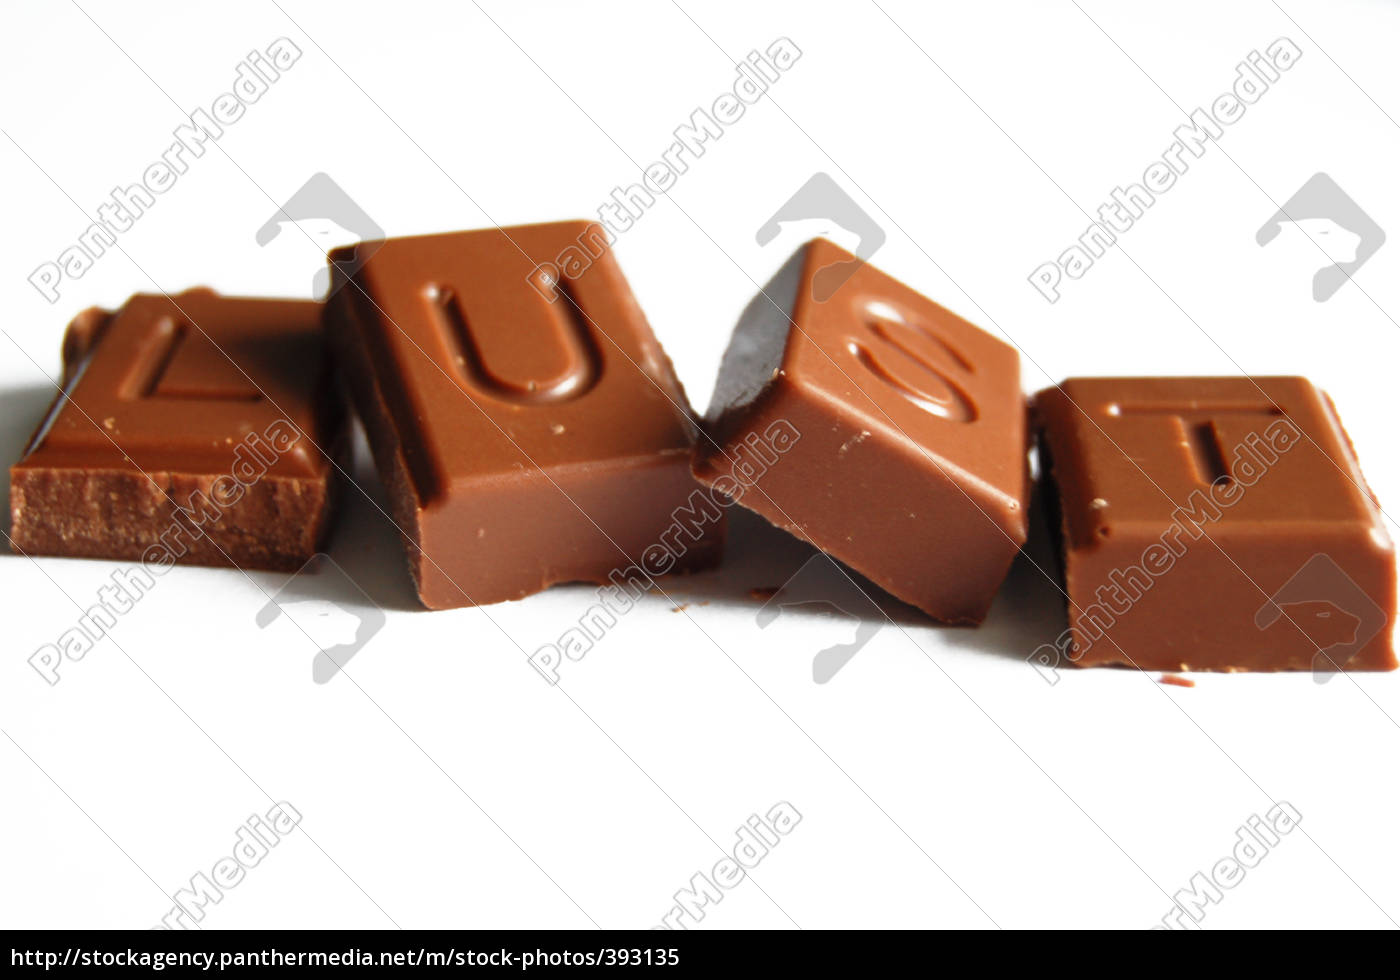 abc, chocolate - 393135